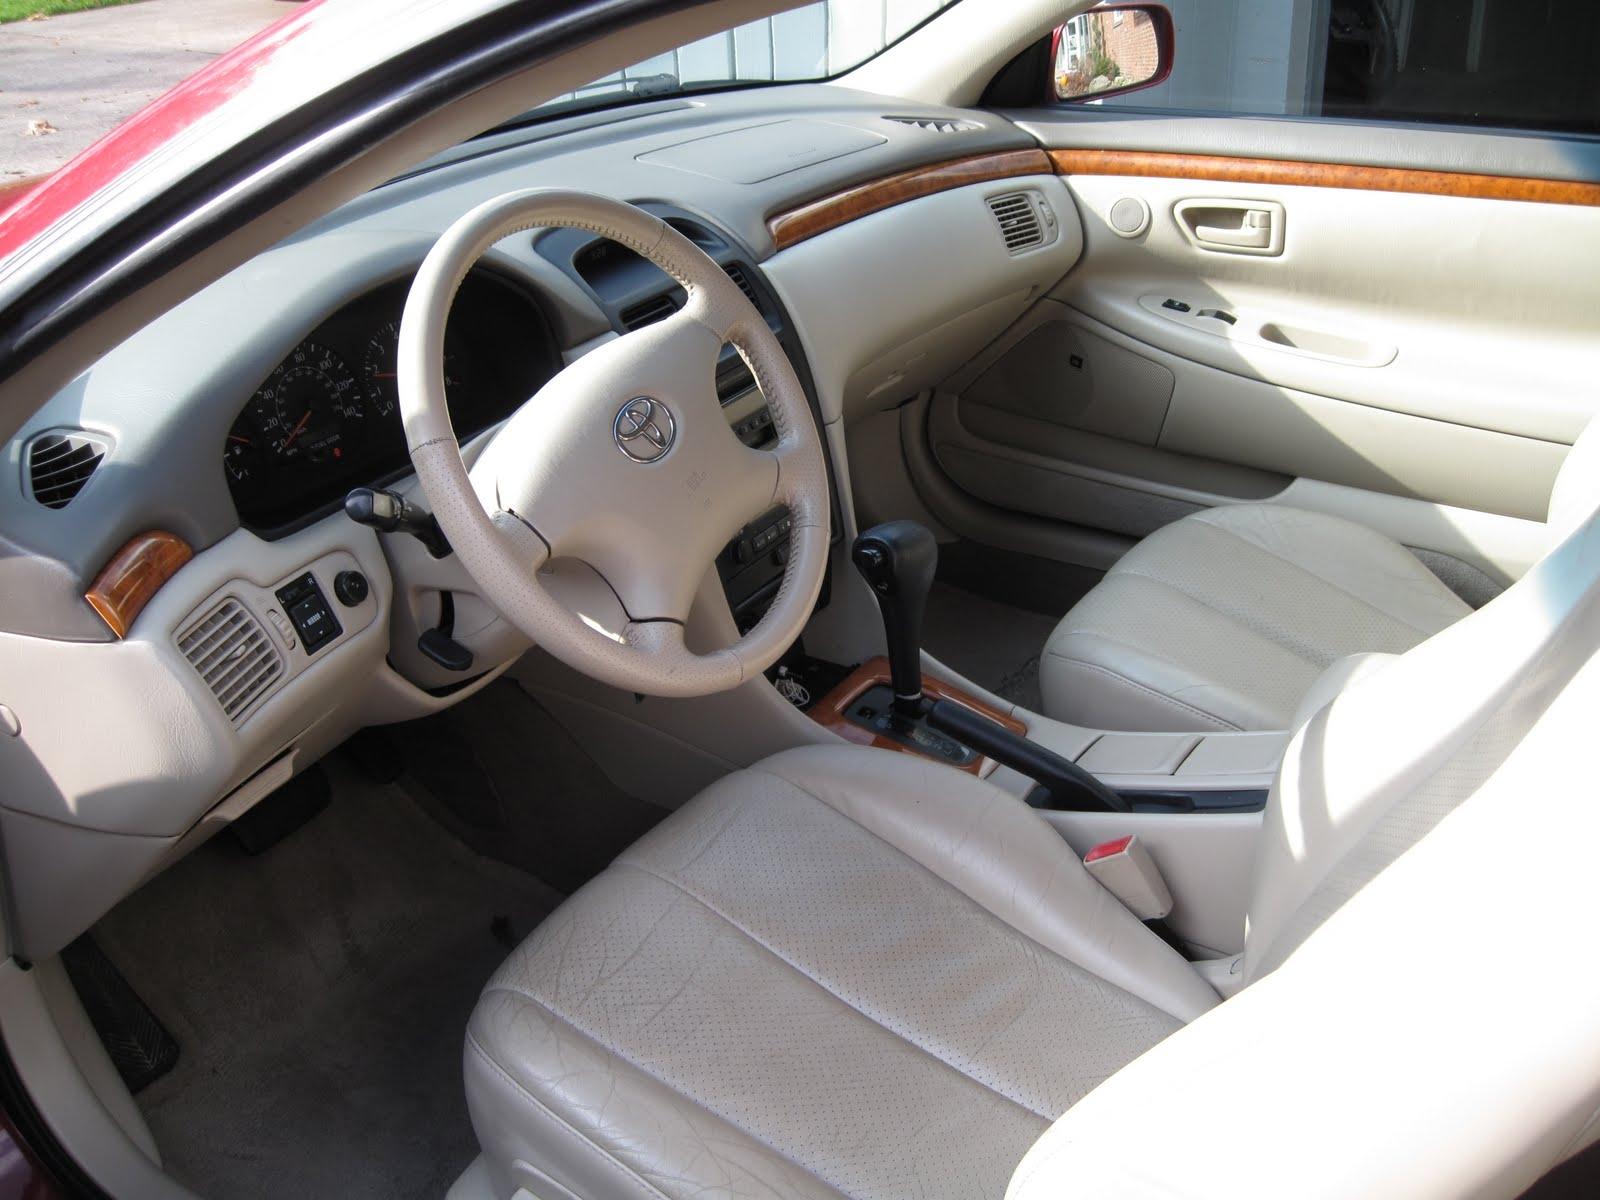 Toyota Camry Solara I 1998 - 2003 Coupe #8